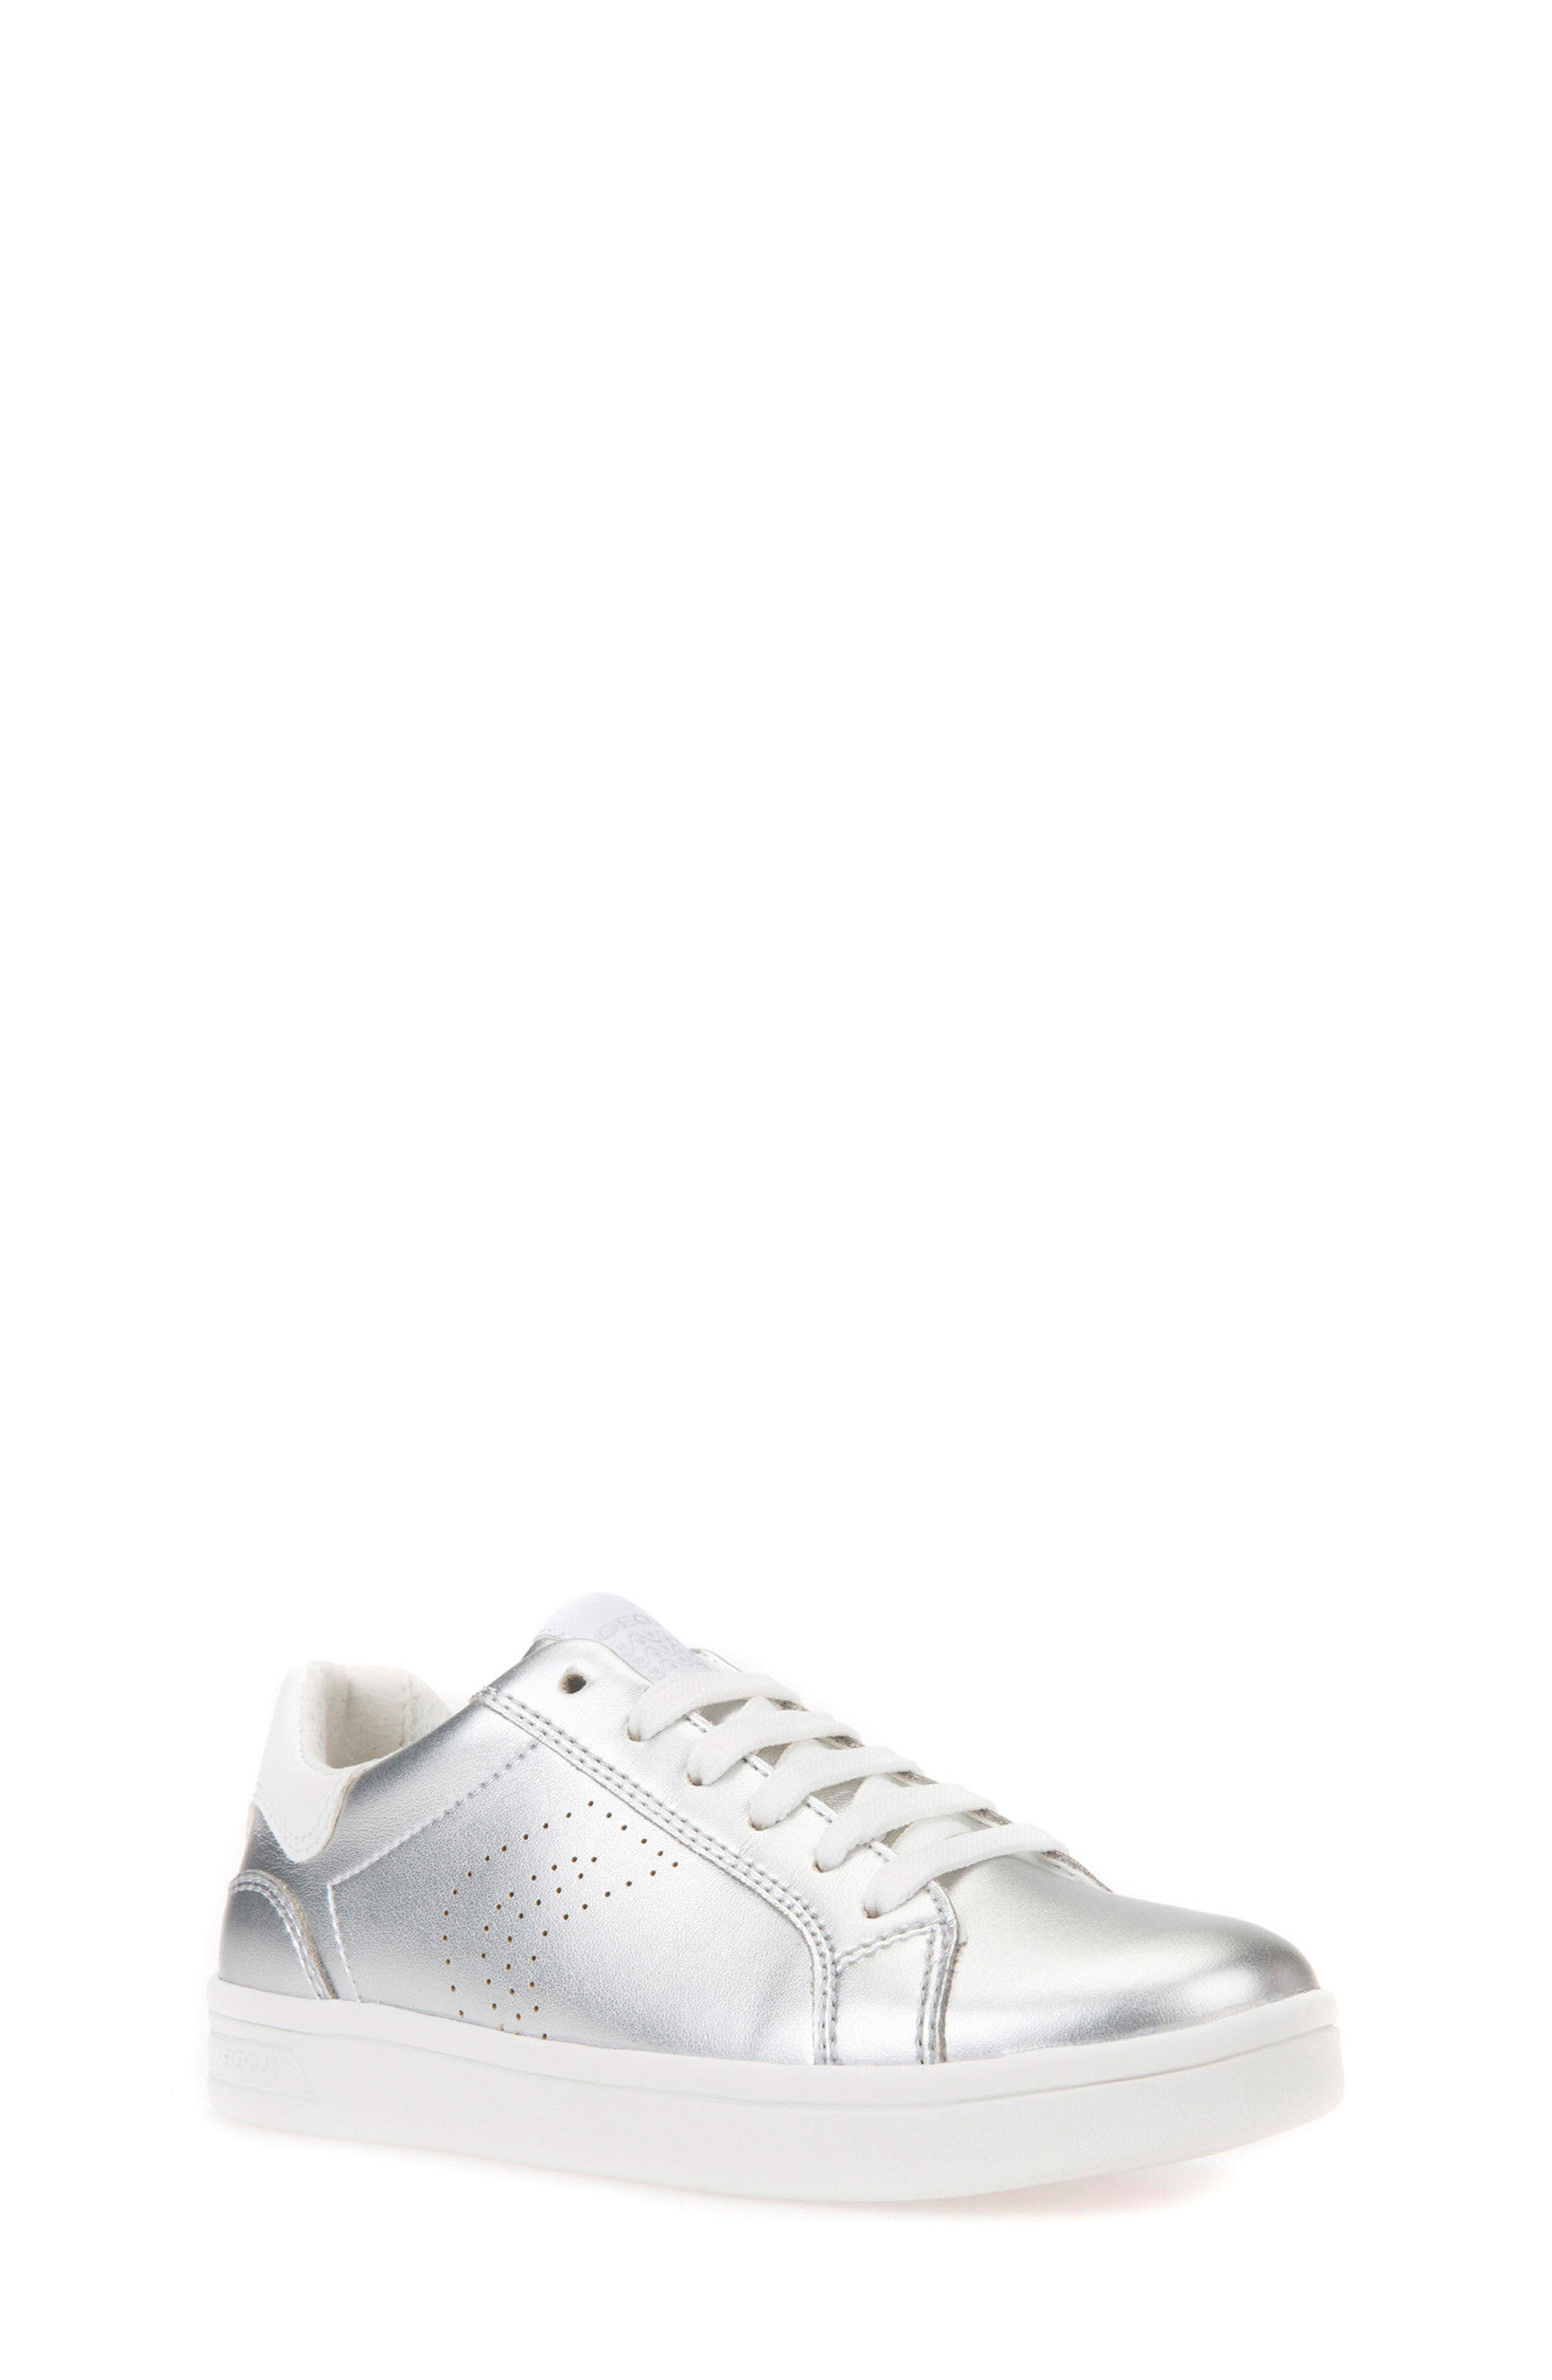 DJ Rock Metallic Low Top Sneaker,                         Main,                         color, Silver